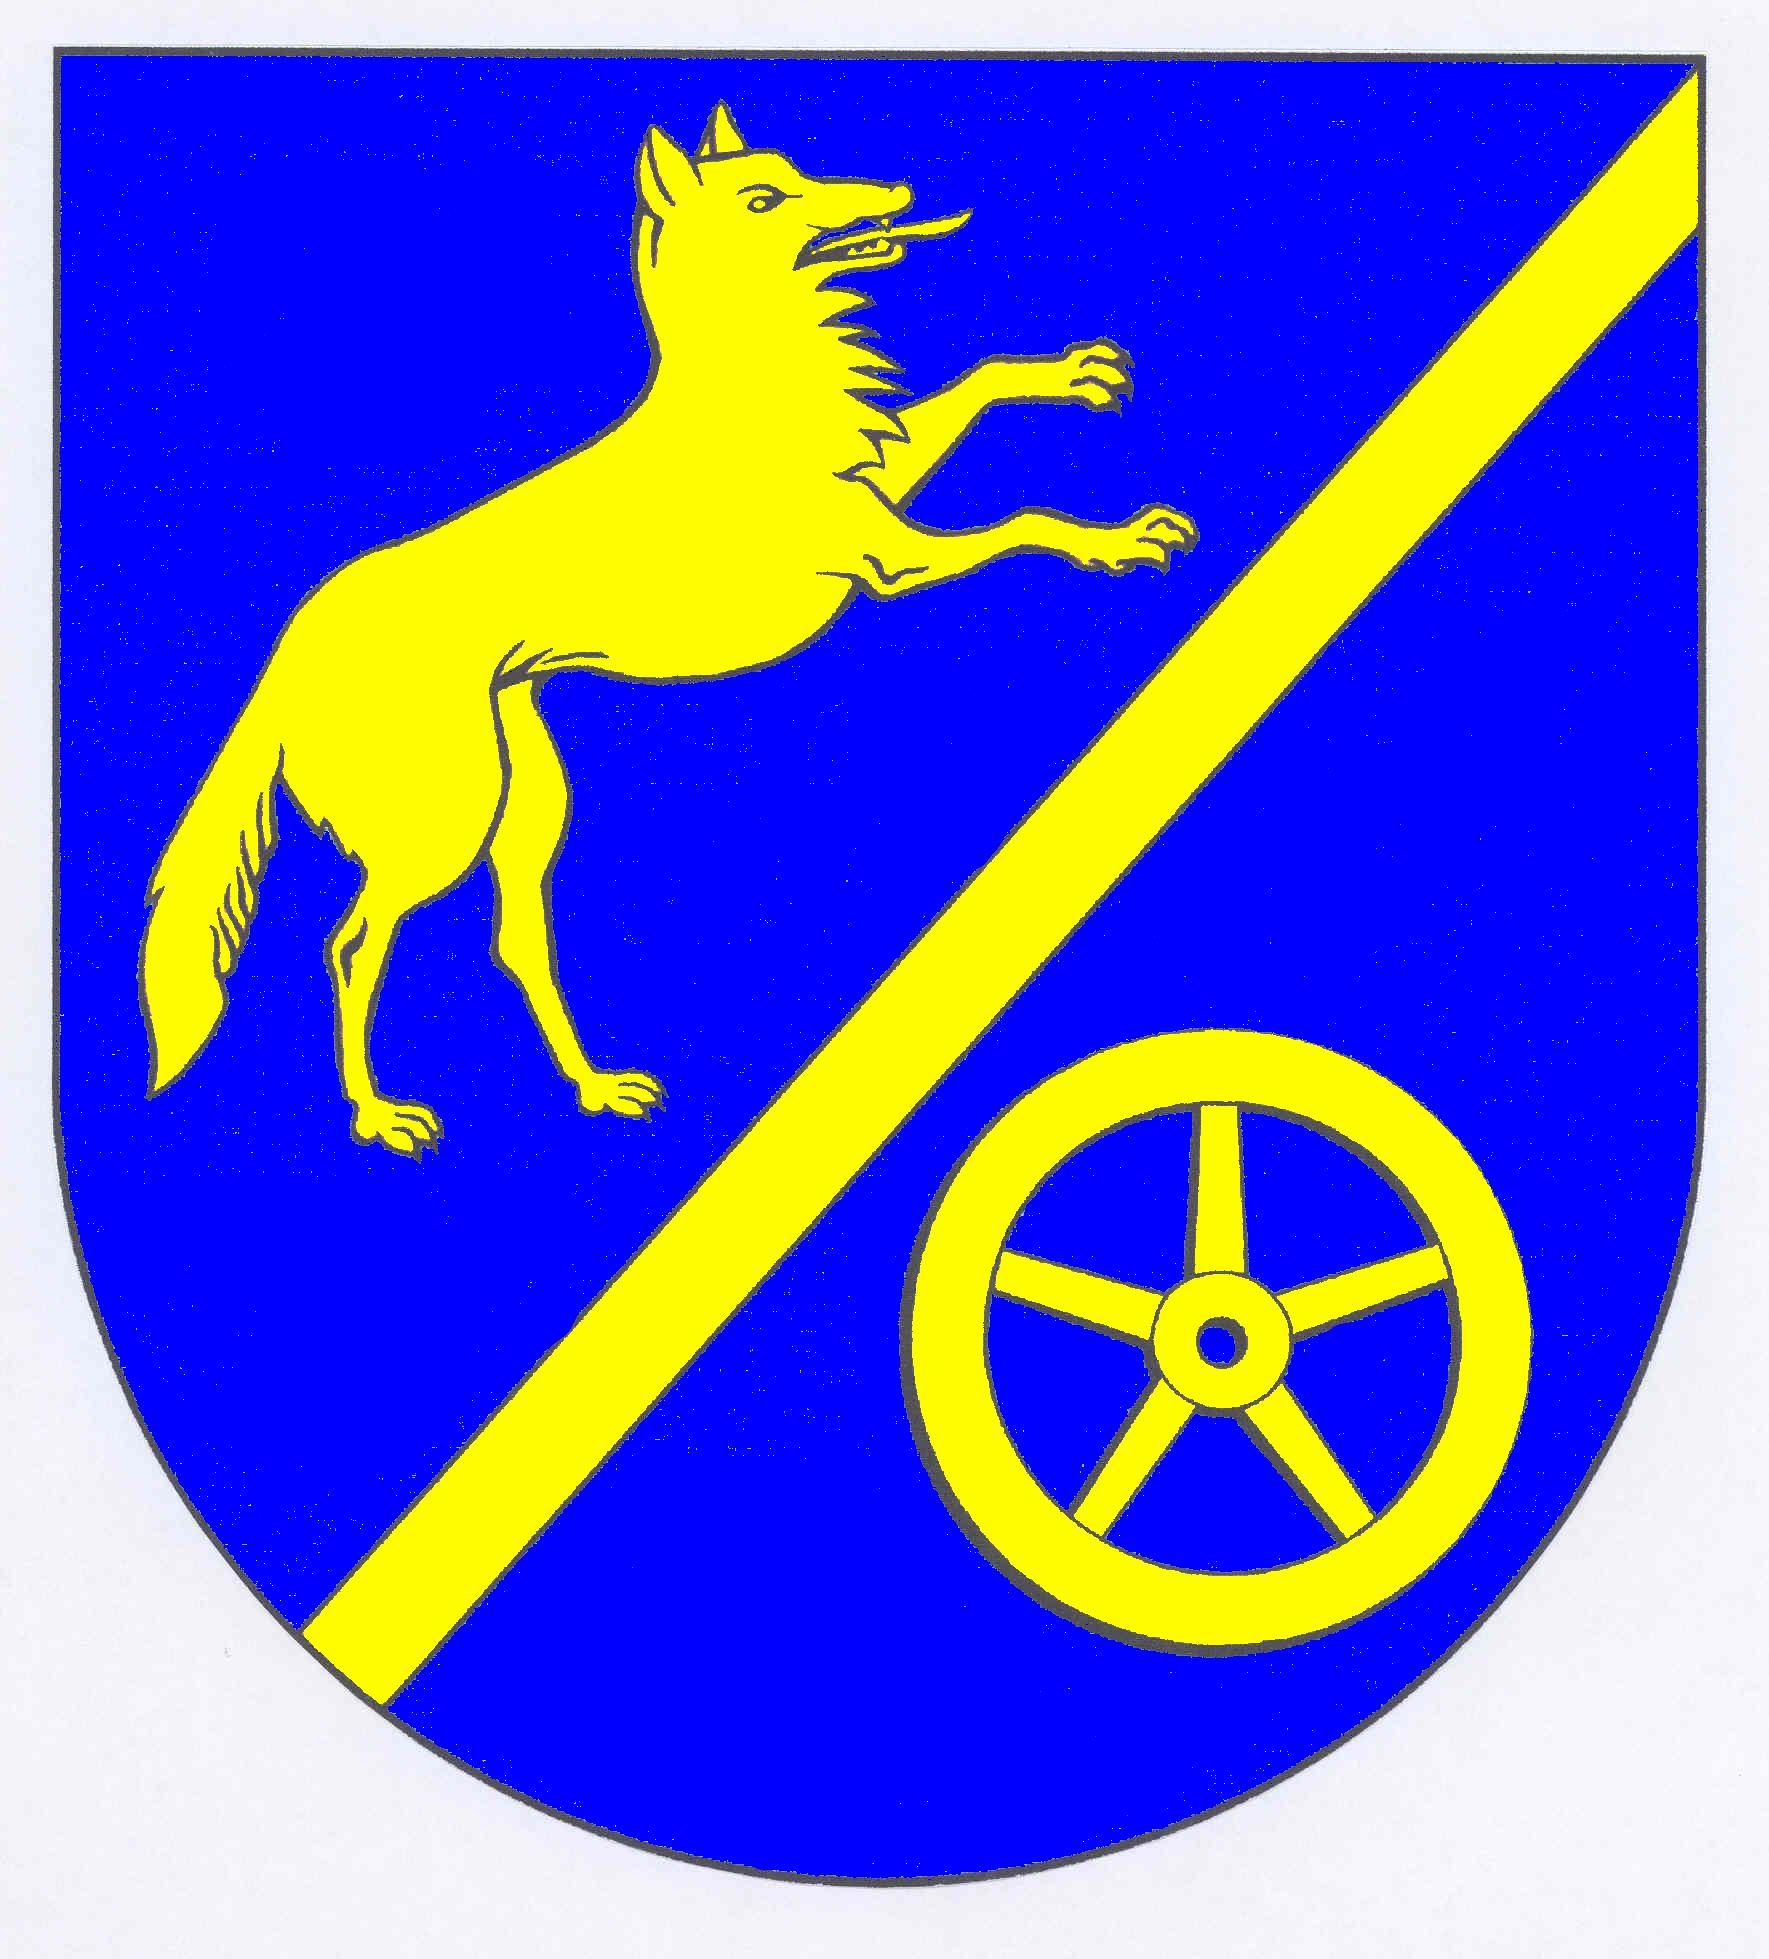 Wappen GemeindeWindeby, Kreis Rendsburg-Eckernförde